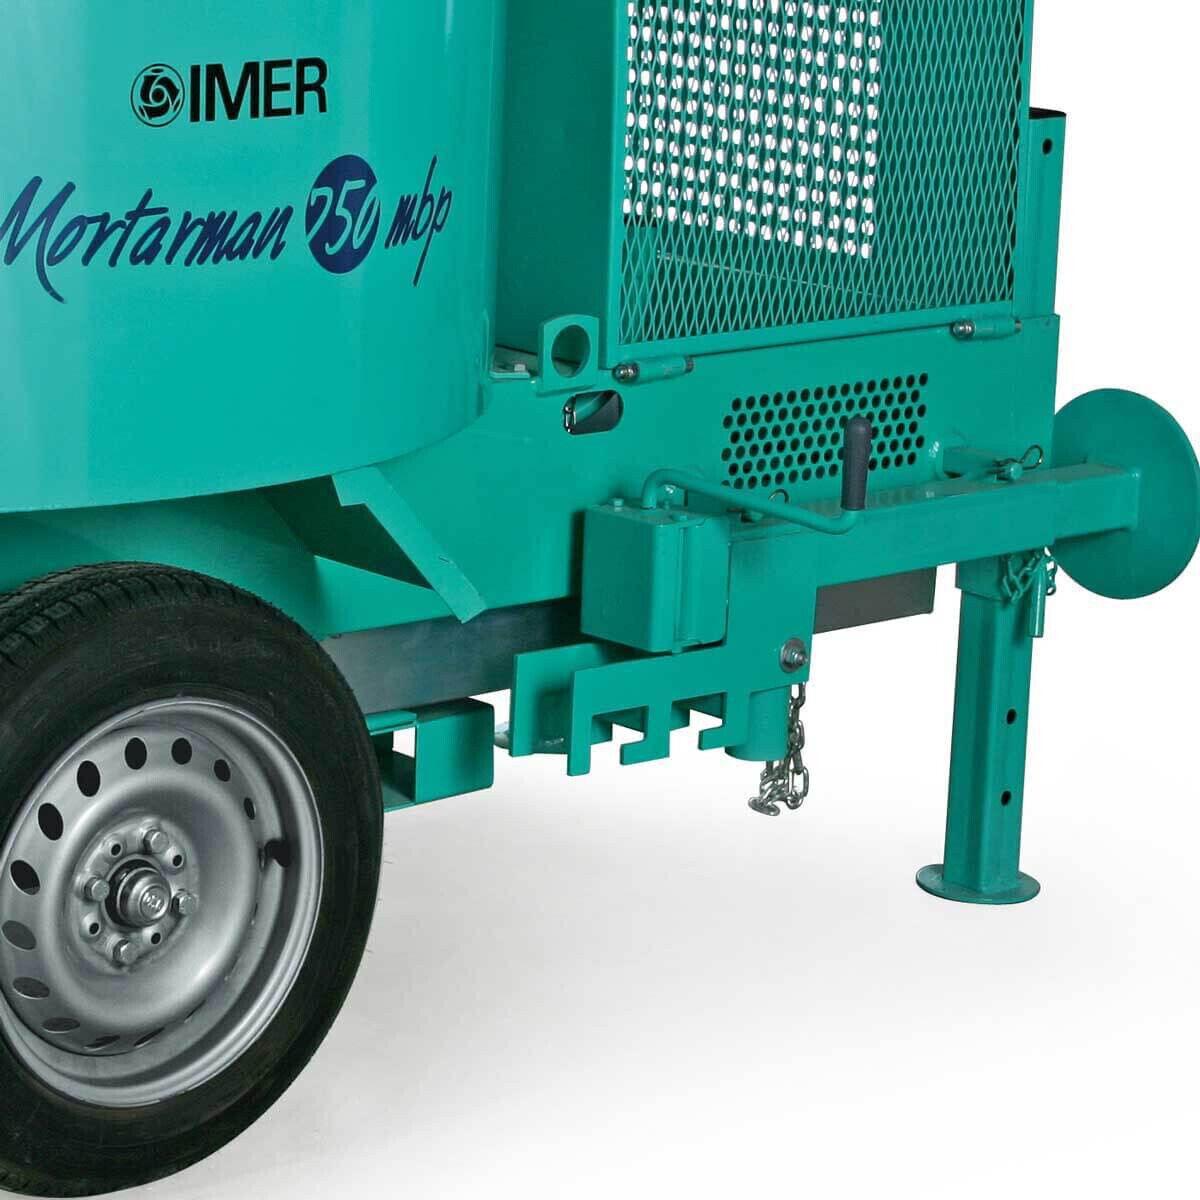 IMER Mortarman 750 Mixer Mixes 1600 lbs of mortar, dry pack, stucco, or sand & cement